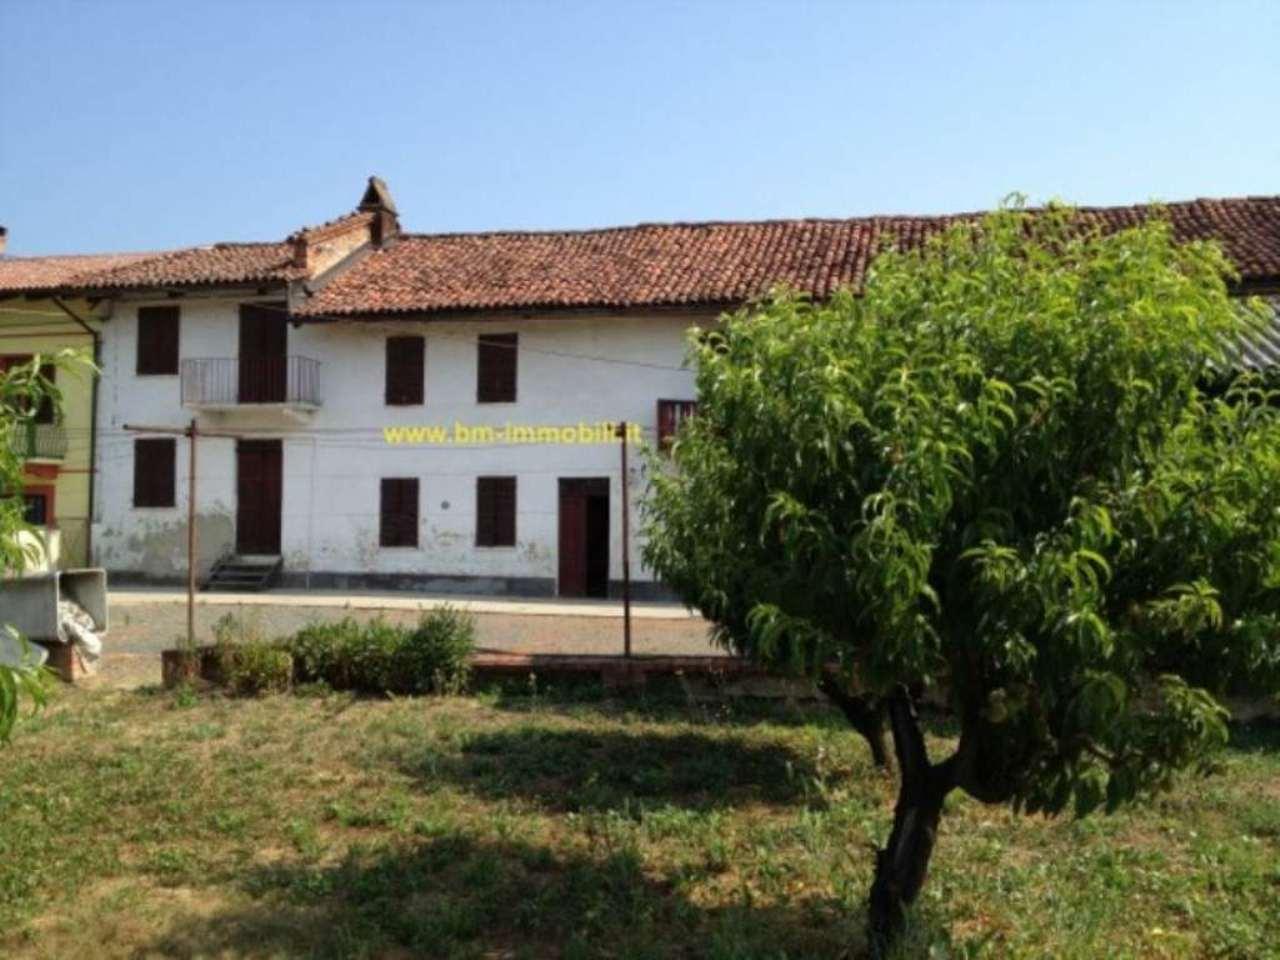 Villafranca d'Asti Vendita CASALE / RUSTICO / CASA / CASCINA Immagine 1